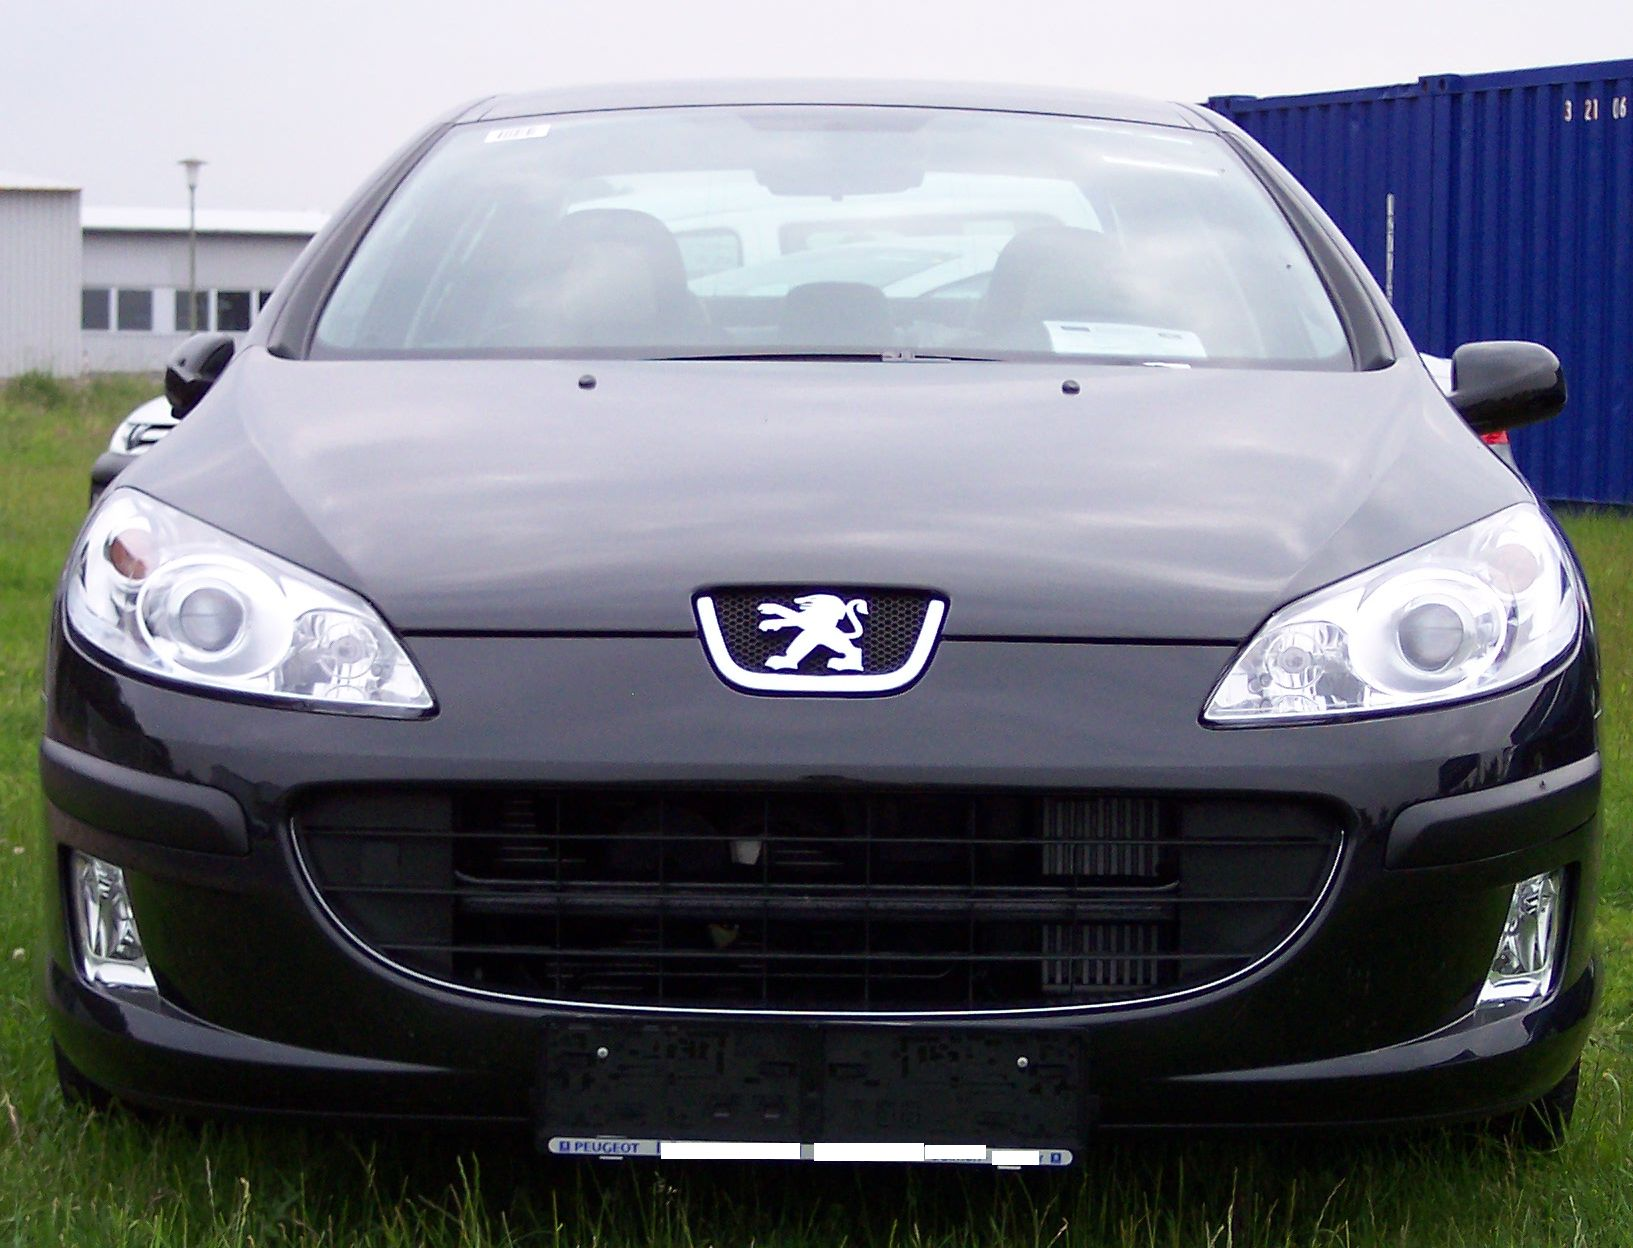 Peugeot 407 SW 1.8 (2005)